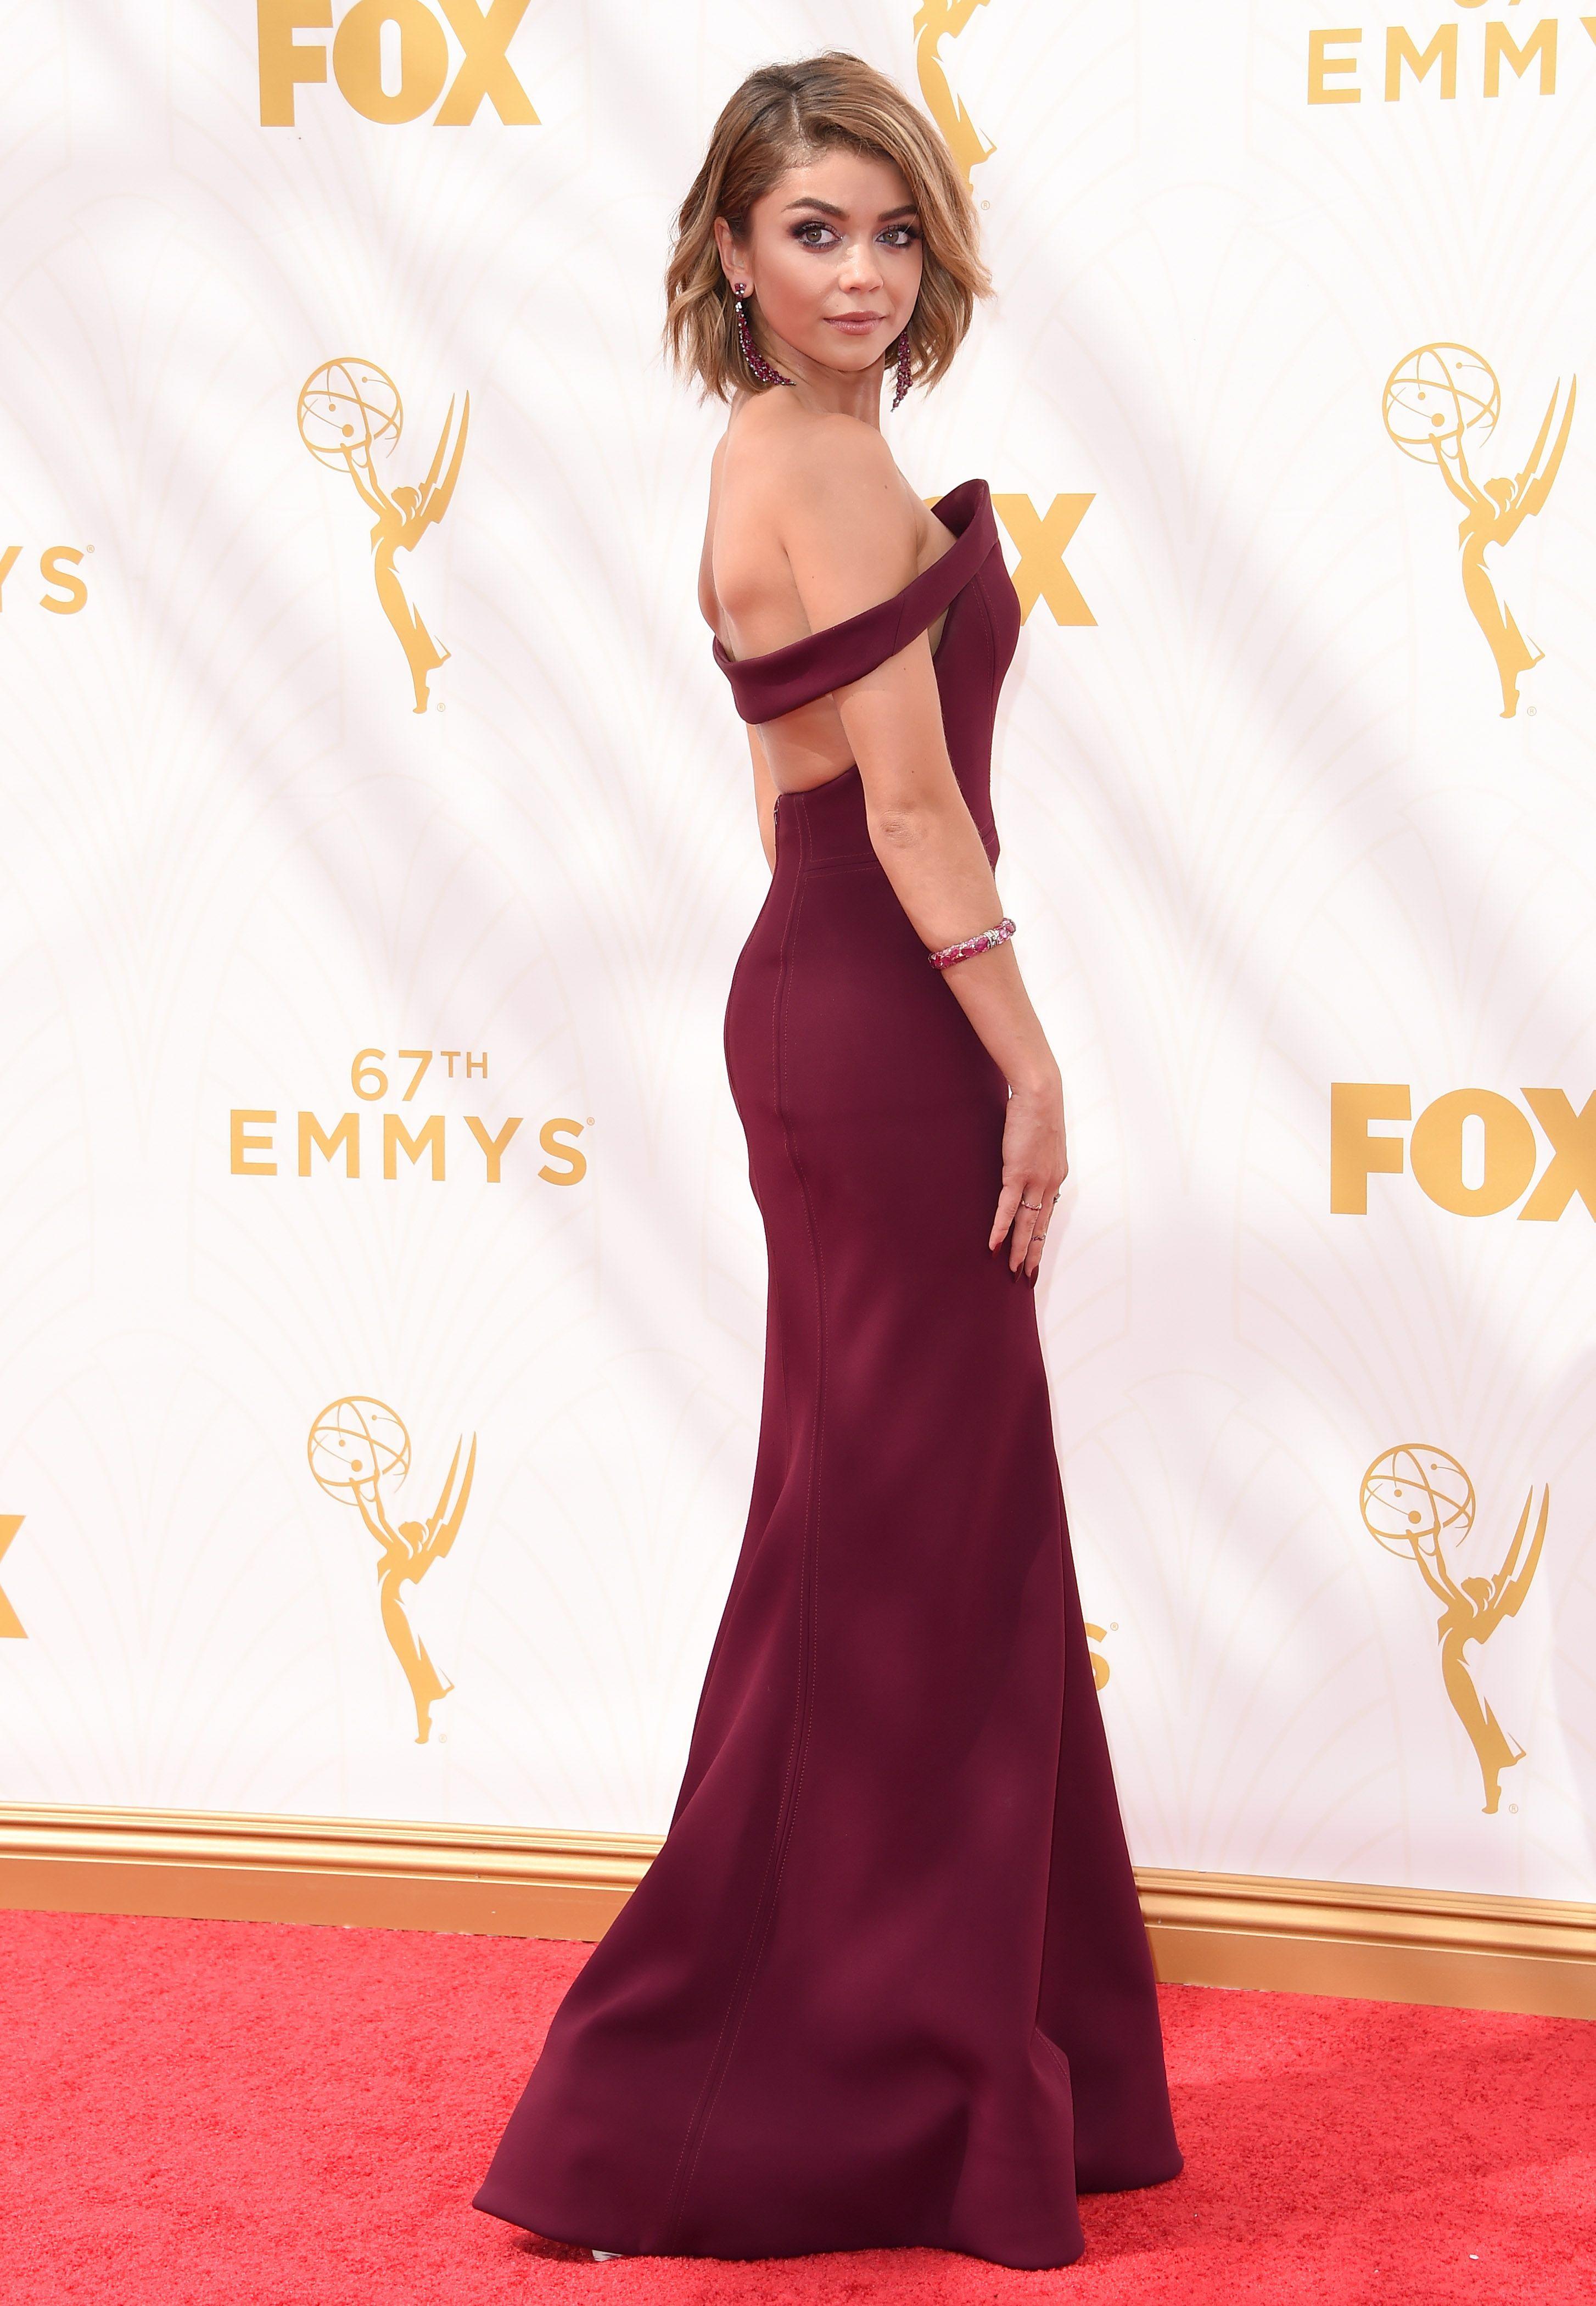 SARAH HYLAND IN ZAC POSEN Attending the 67th Annual Emmy Awards, September 20.